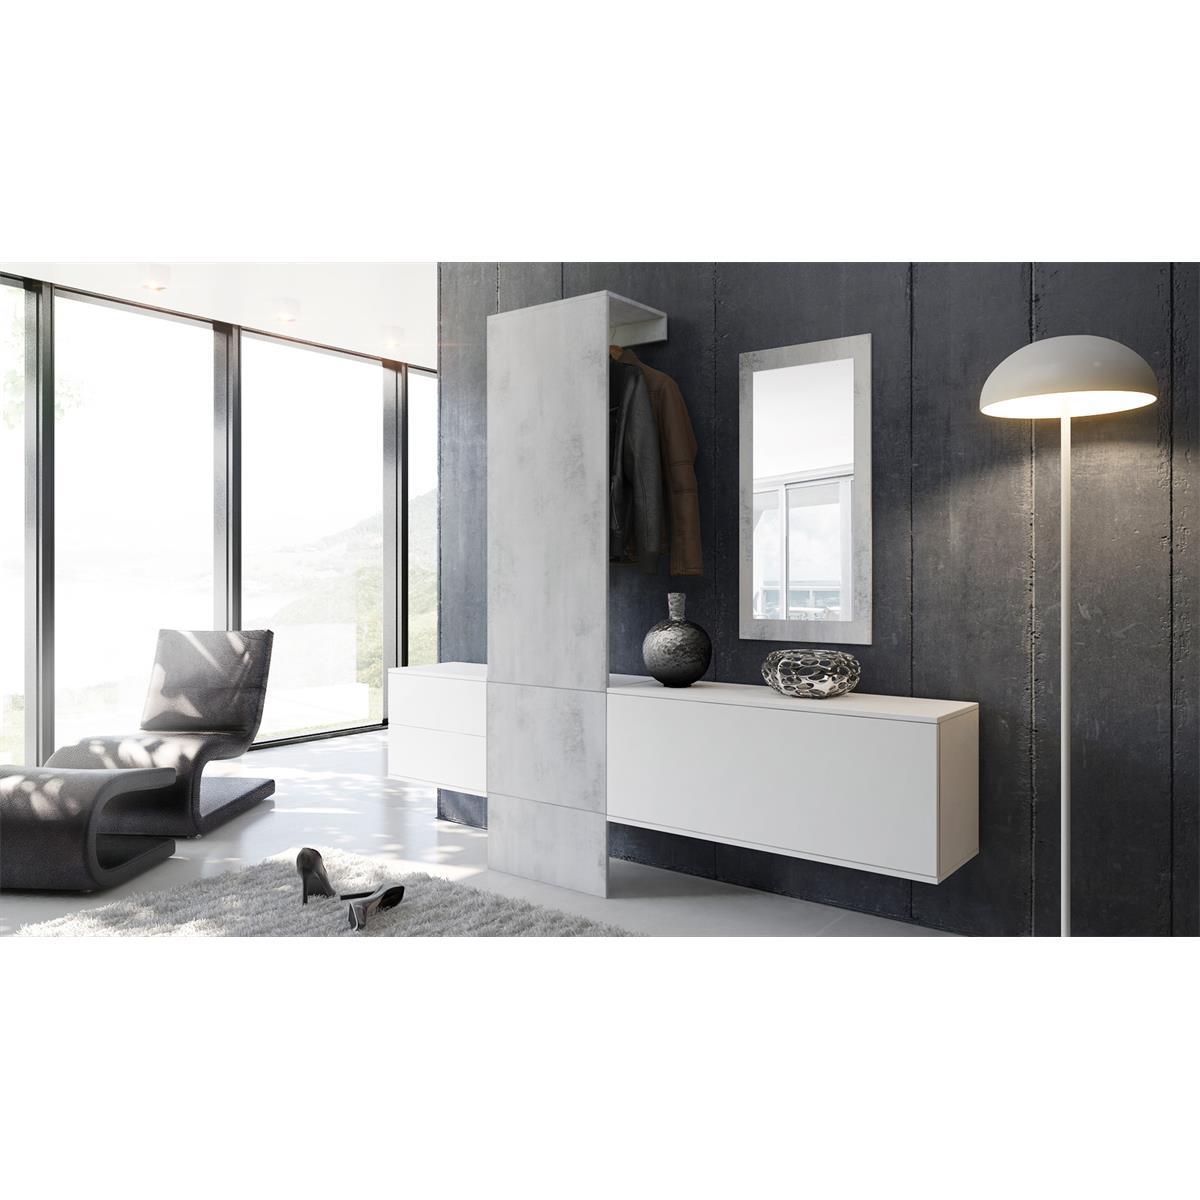 Garderobe carlton set 1 beton oxid spiegel beton for Garderobe carlton